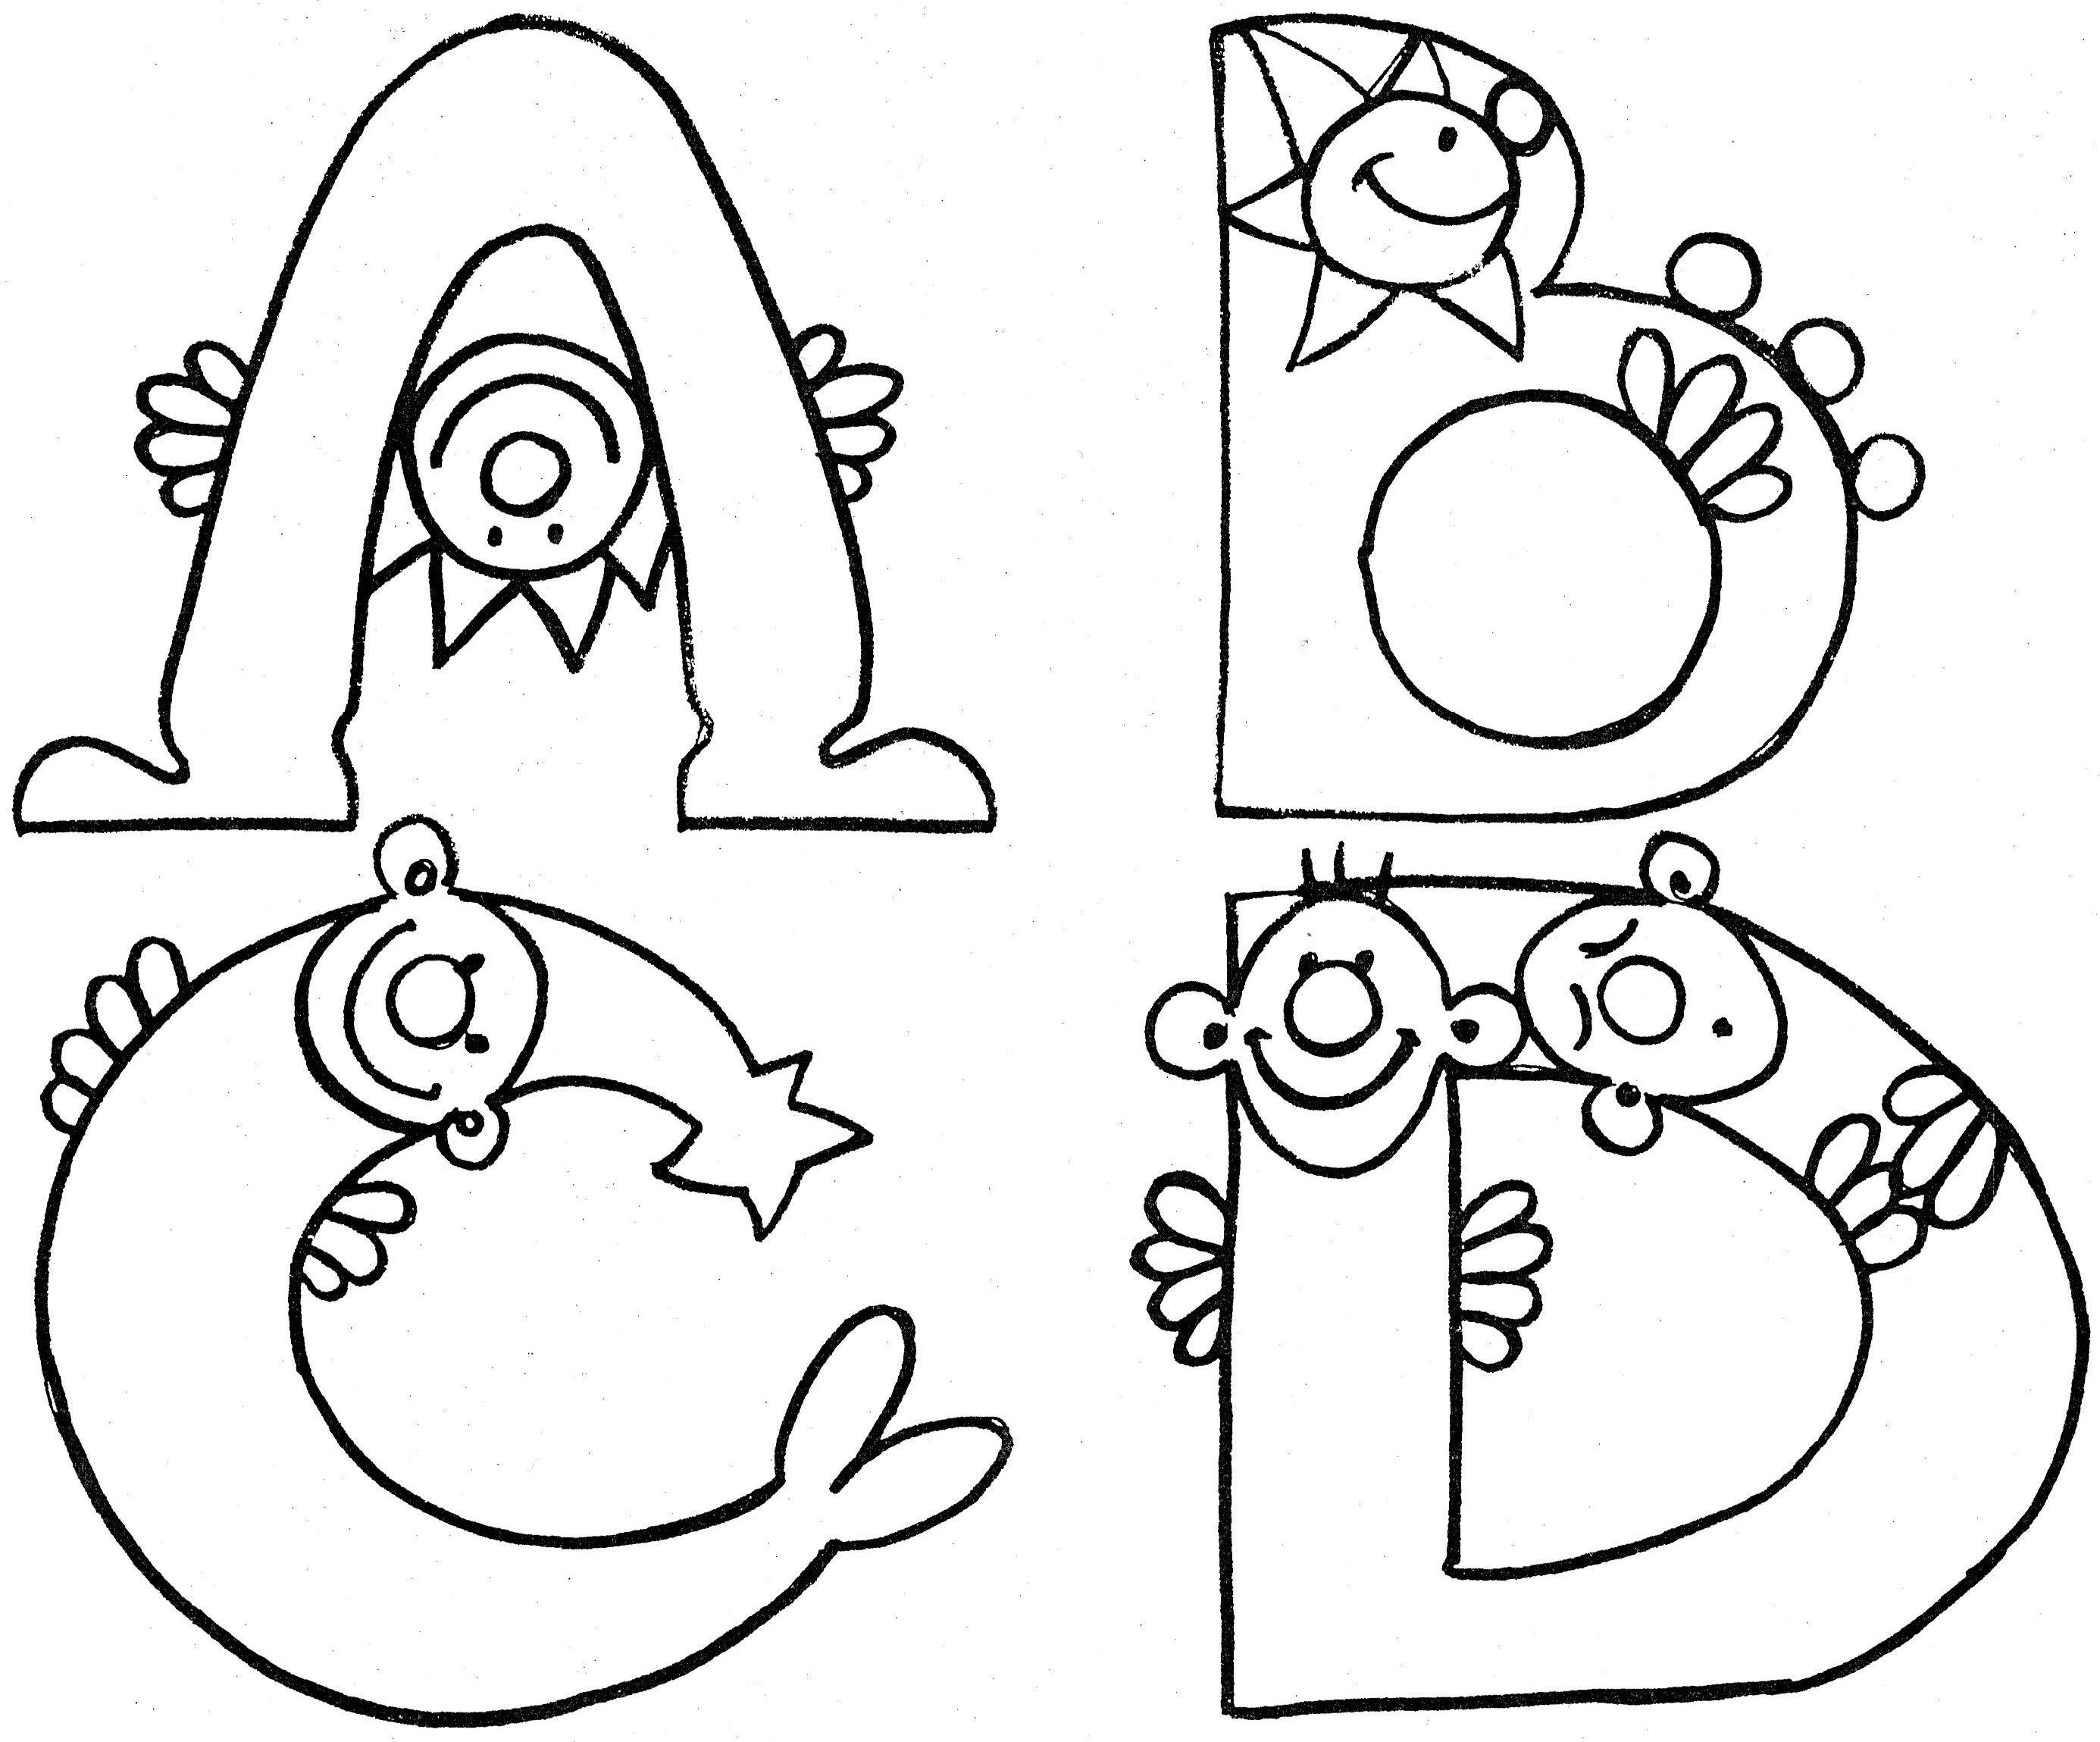 Bohocos Betuk Scrapbook Fonts Envelope Art Letter Art